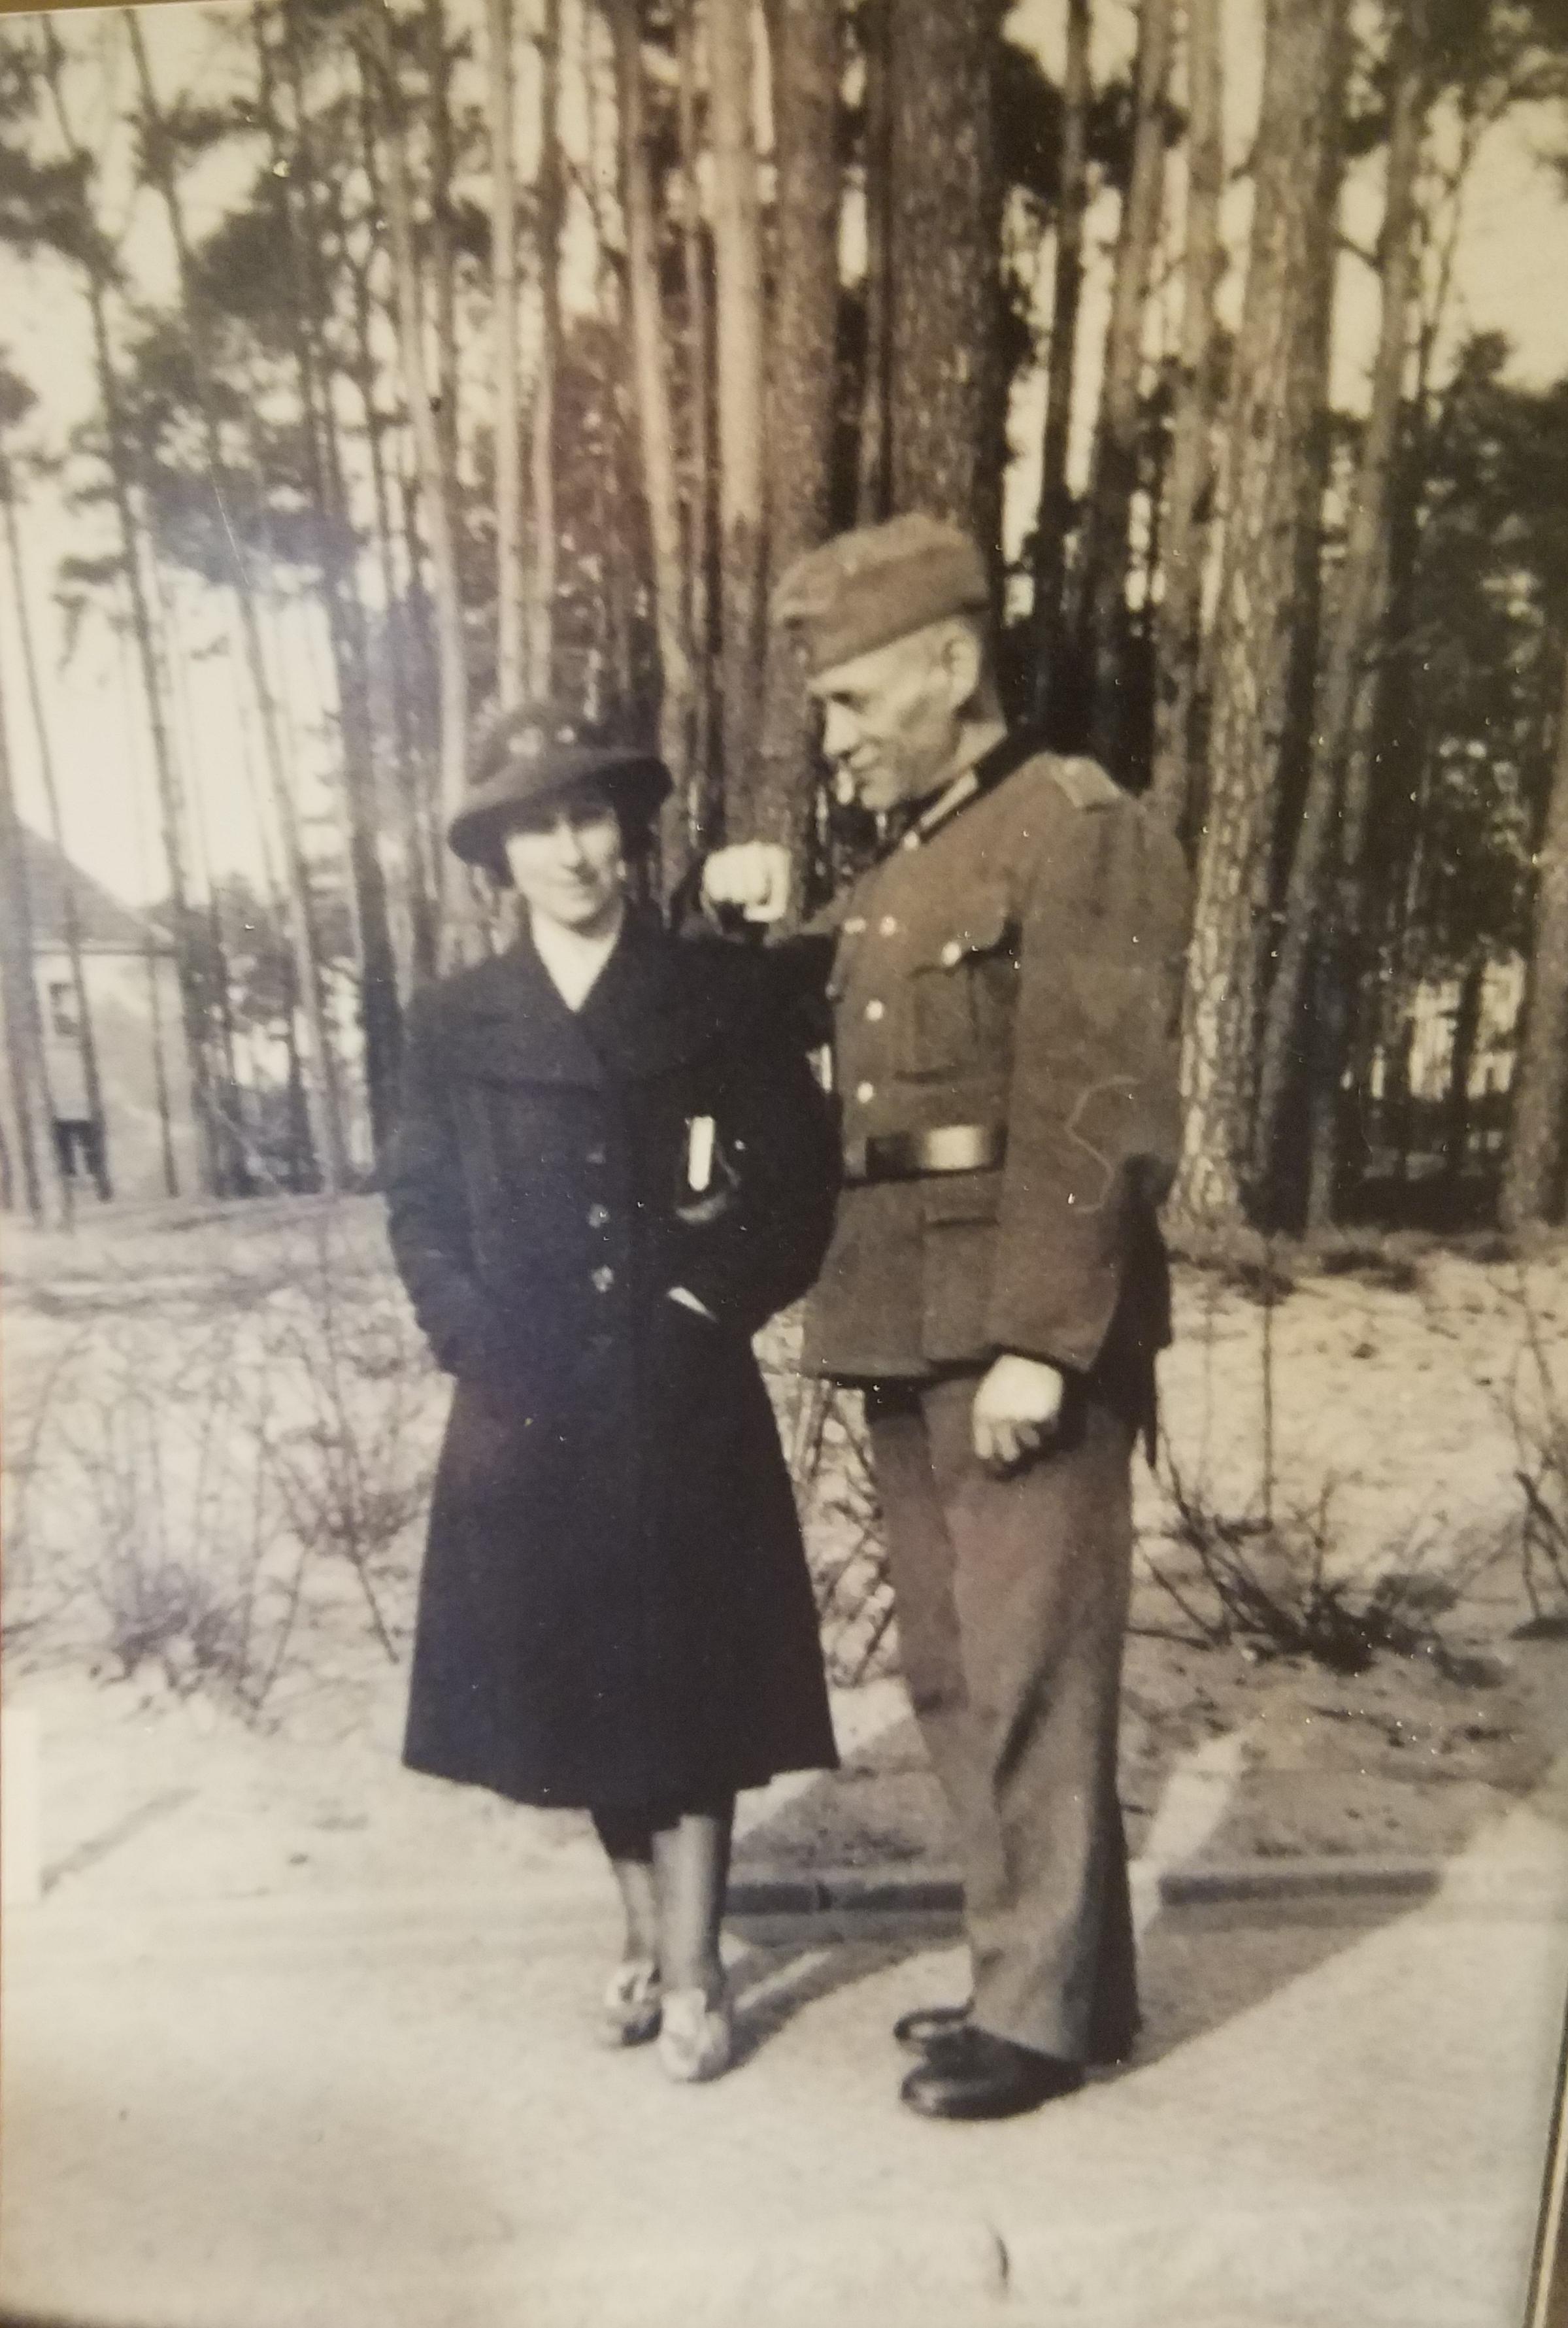 WW2 German uniform identification